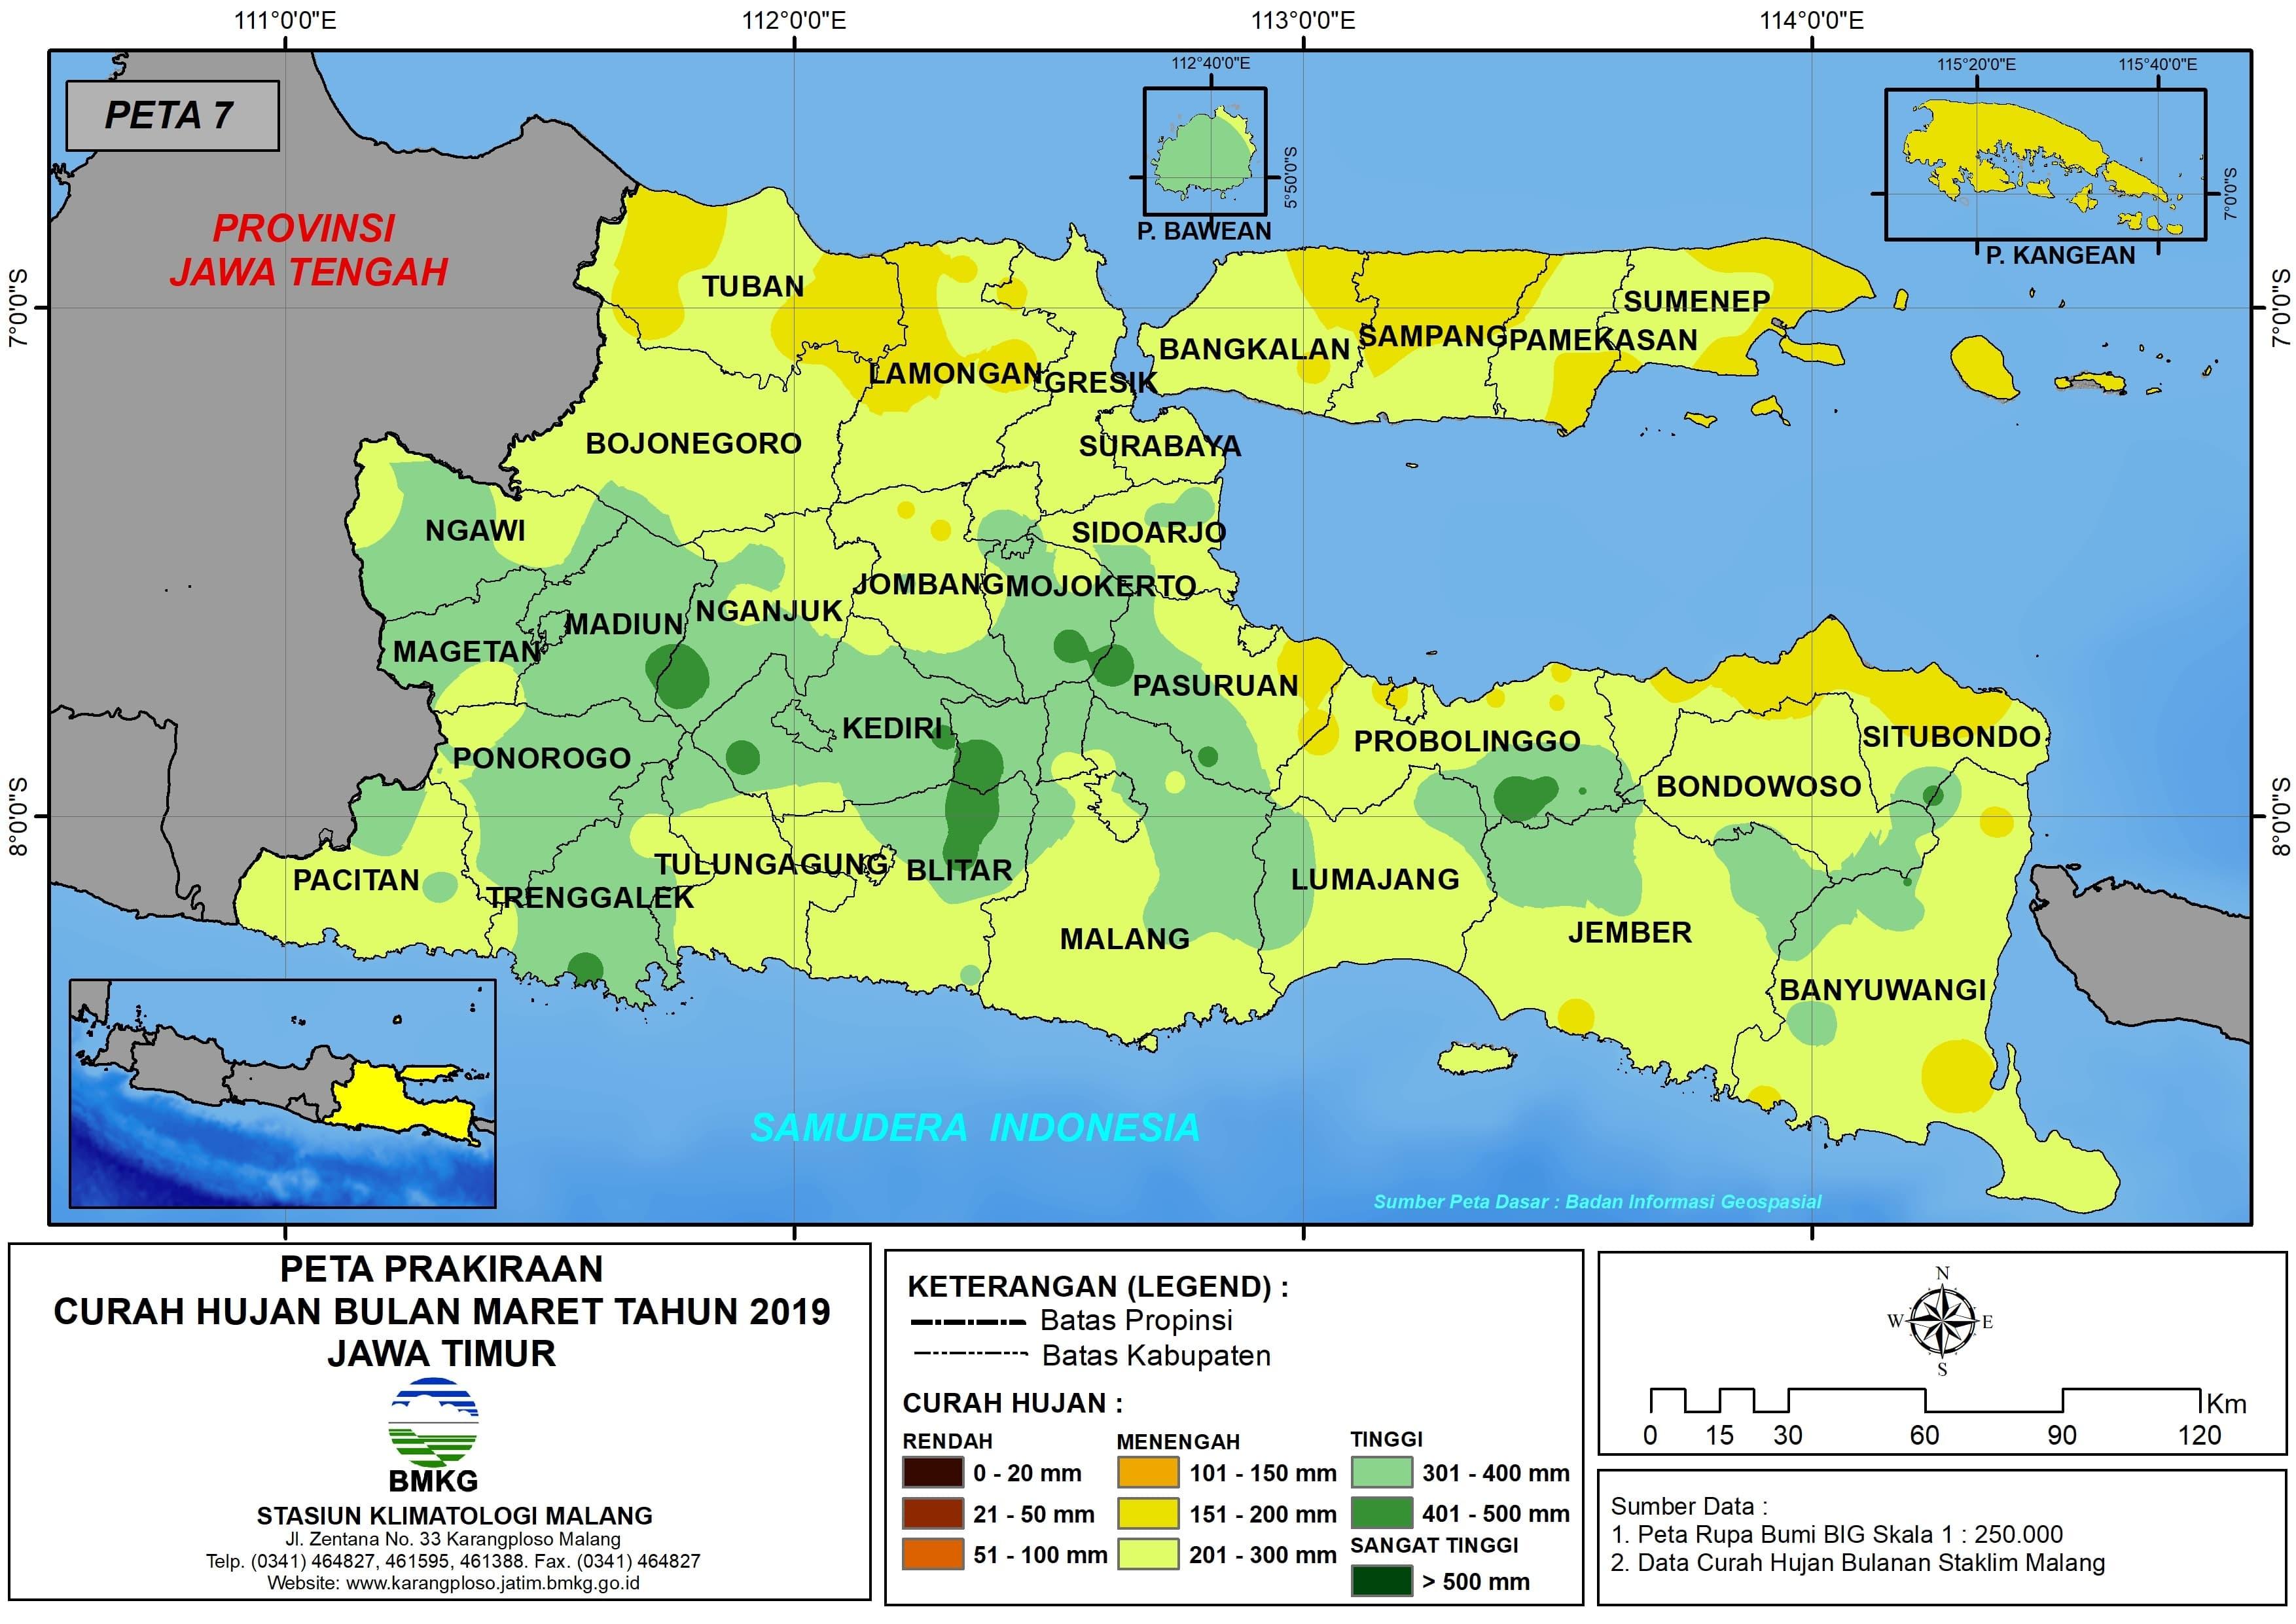 Prakiraan Curah Hujan Bulan Maret Tahun 2018 di Provinsi Jawa Timur Update dari Analisis Bulan Desember 2018